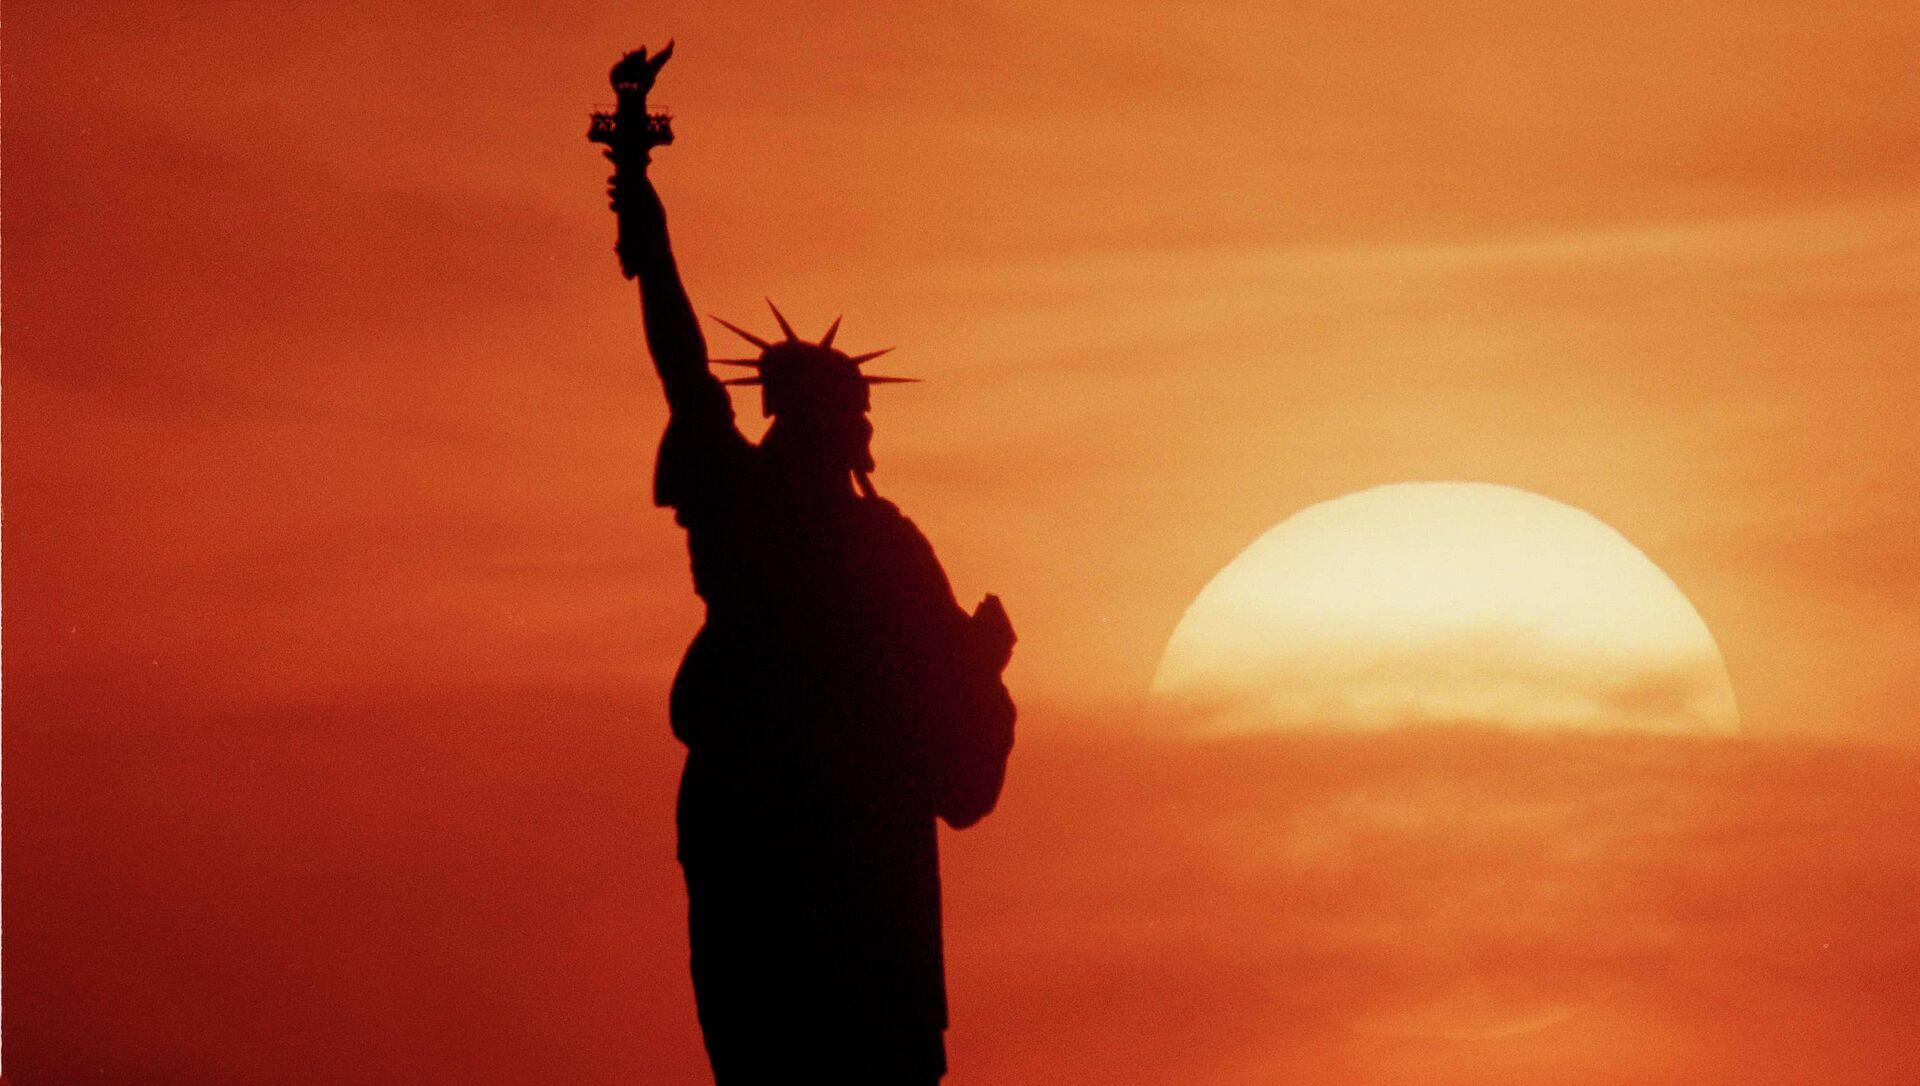 Statue of Liberty - Sputnik International, 1920, 09.03.2021